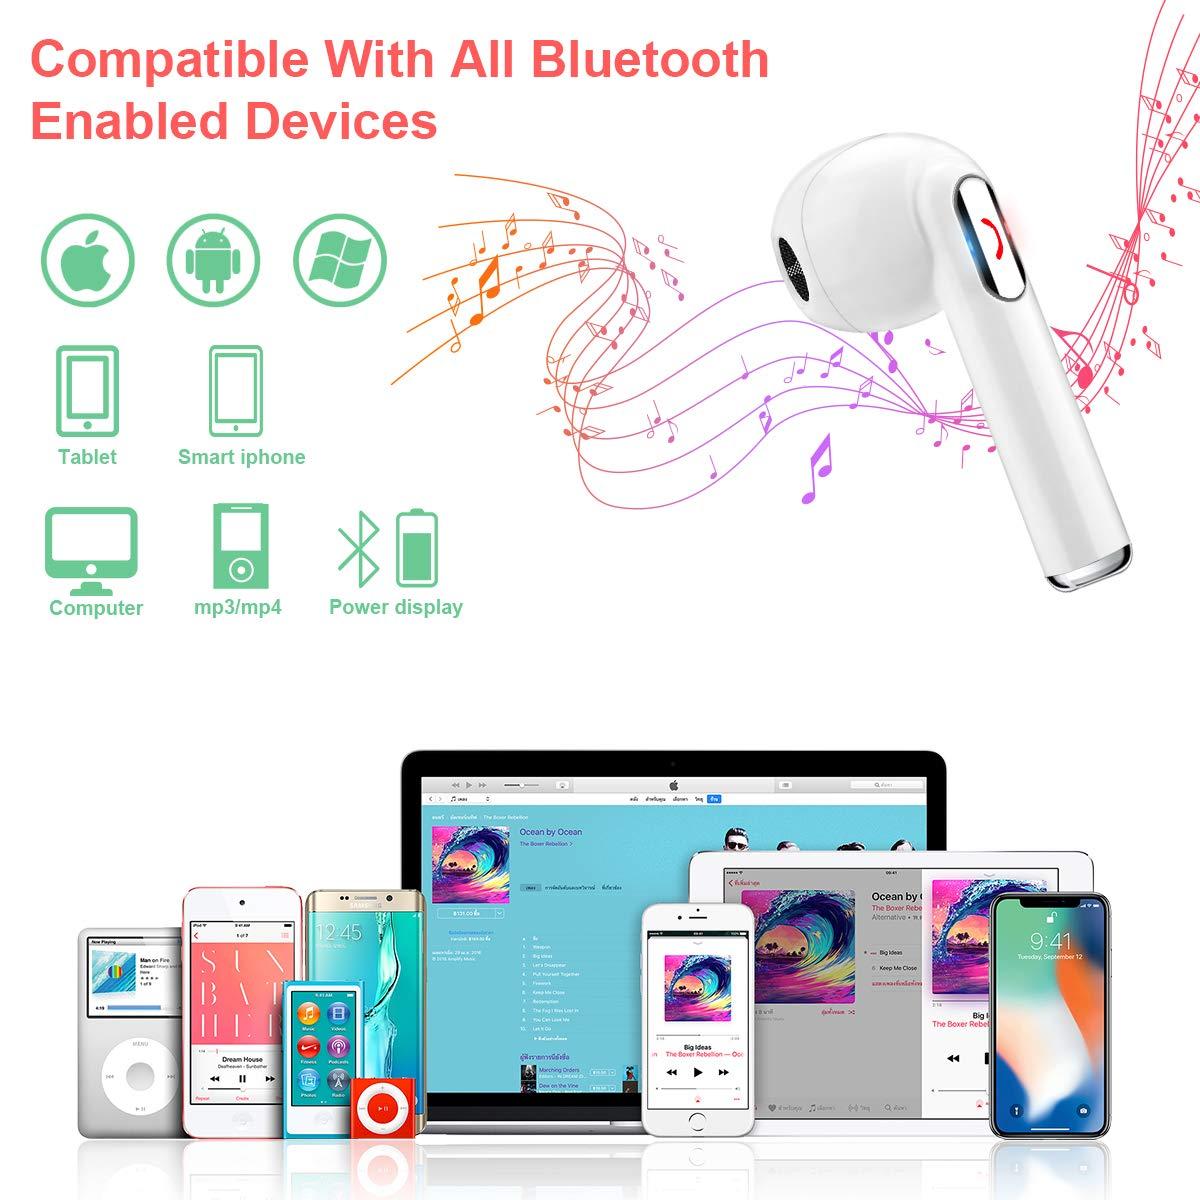 Cuffie Bluetooth,Auricolari Bluetooth Cuffie Wireless Auricolari Senza Fili Auricolari con Microfono Stereo Auricolare Wireless Sport Auricolari In Ear per iPhone,Samsung e altri Smartphone Bianca